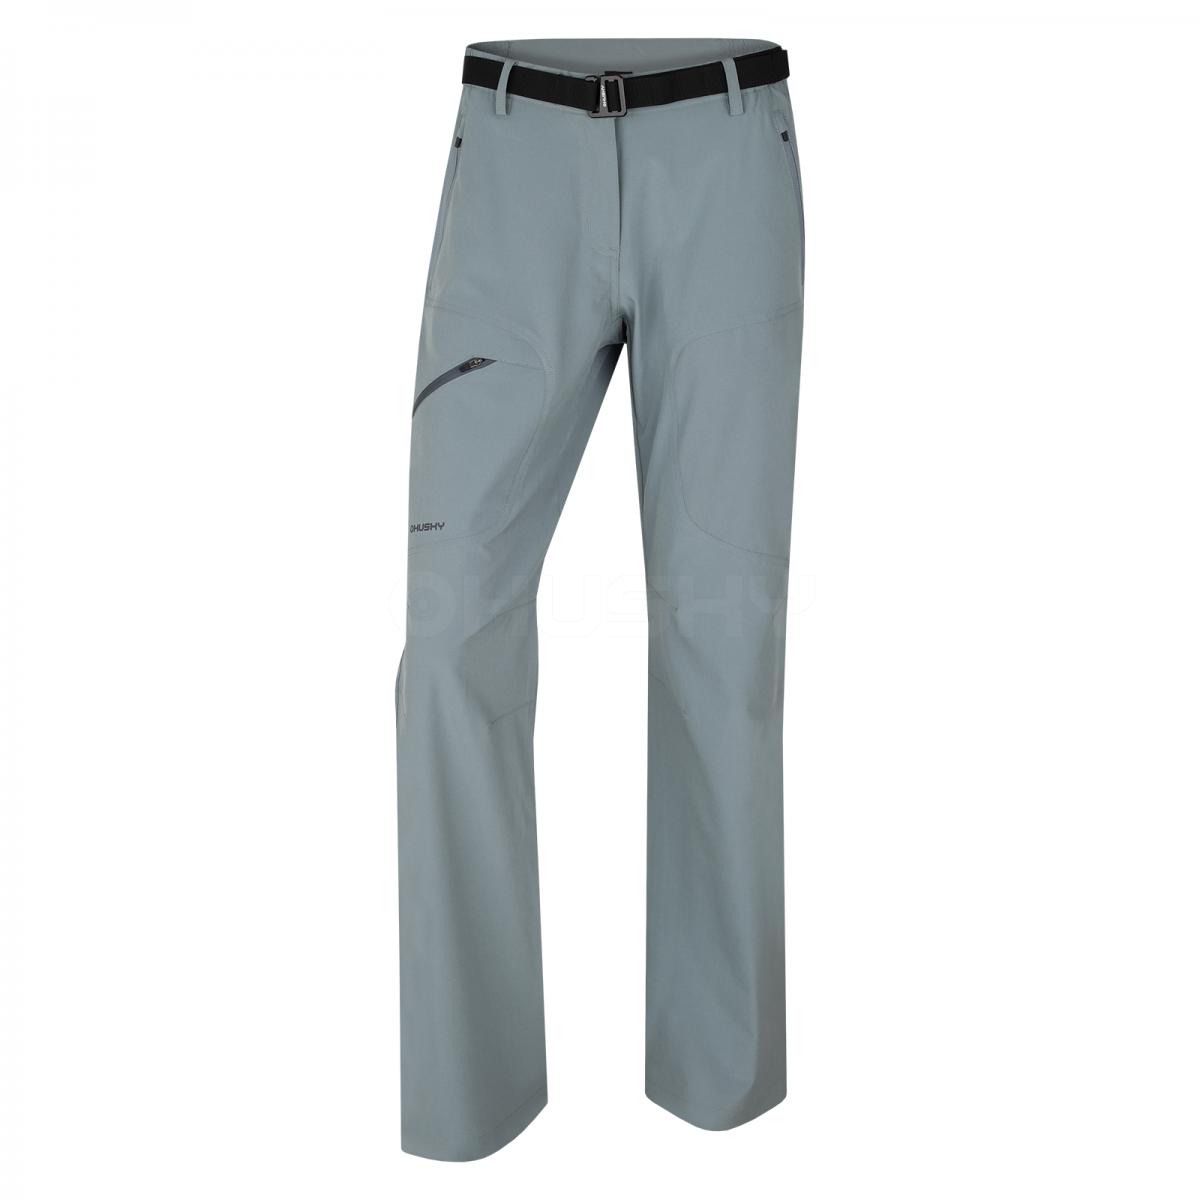 a546f5d176d Dámské outdoor kalhoty - Keasy L – šedá